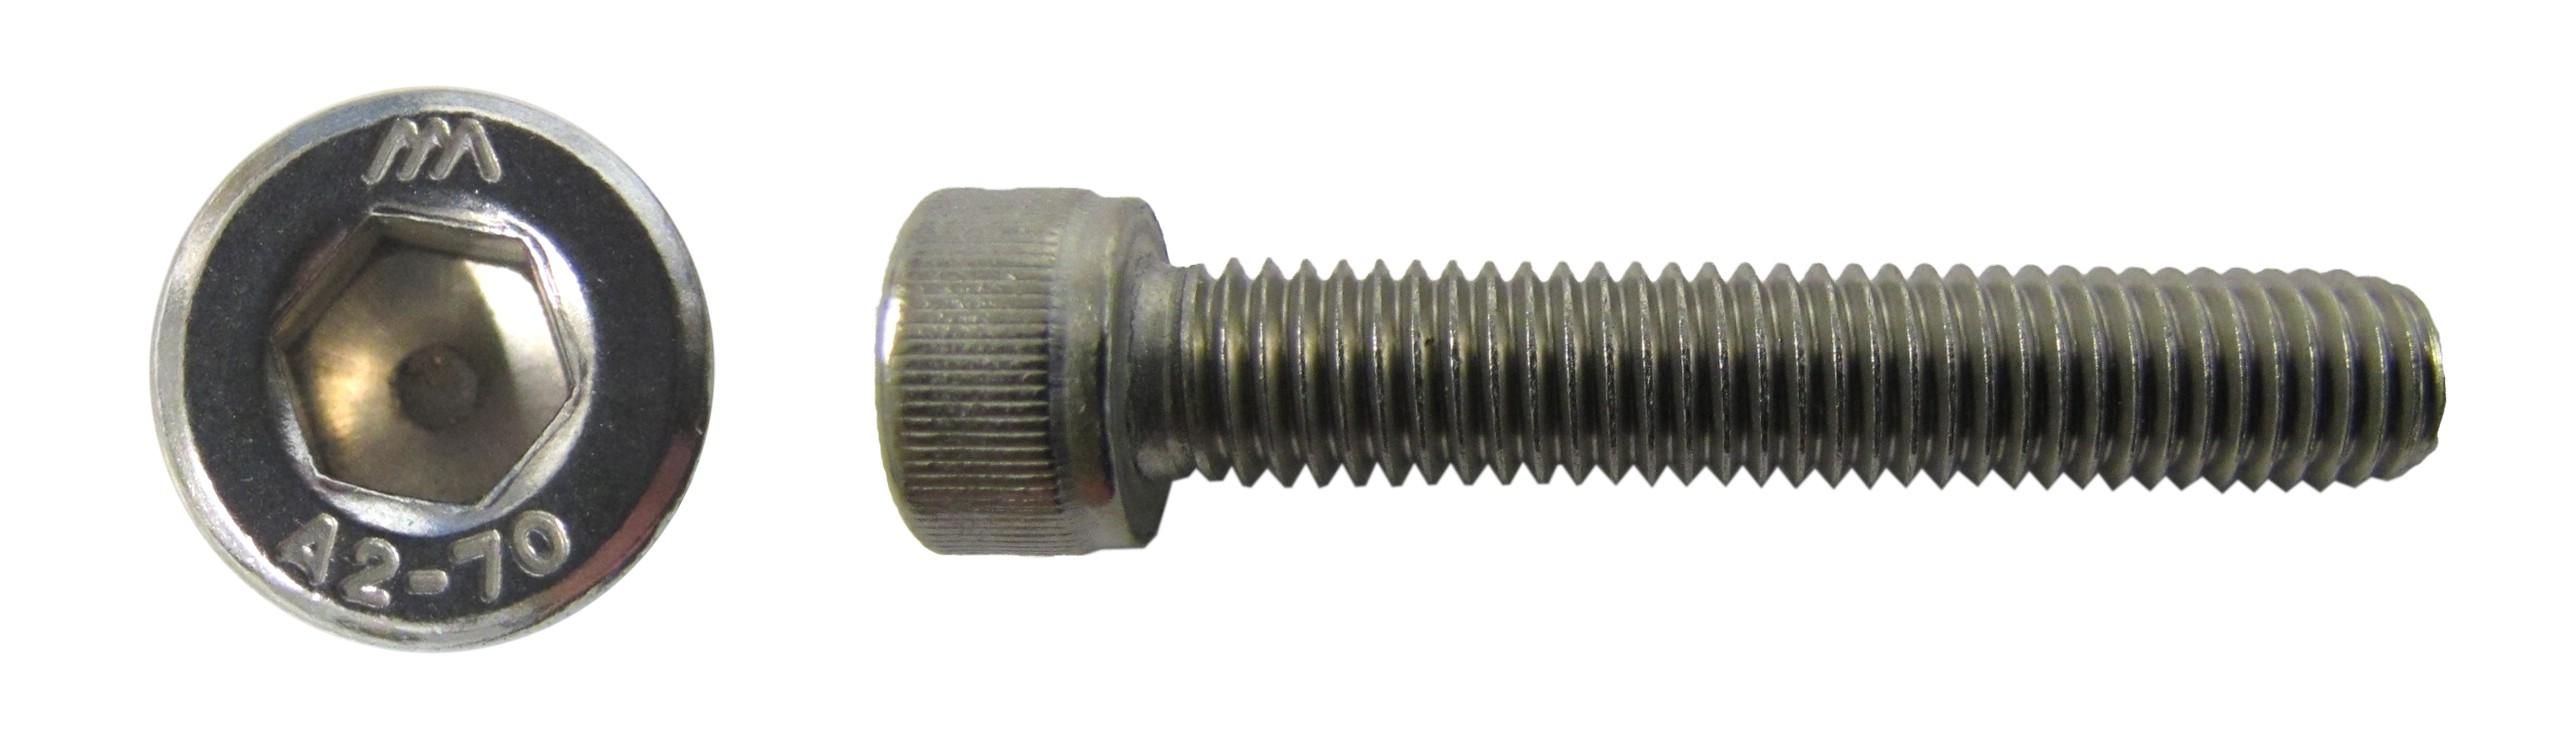 Screws Allen Stainless Steel 8mm x 50mm Per 20 Pitch 1.25mm